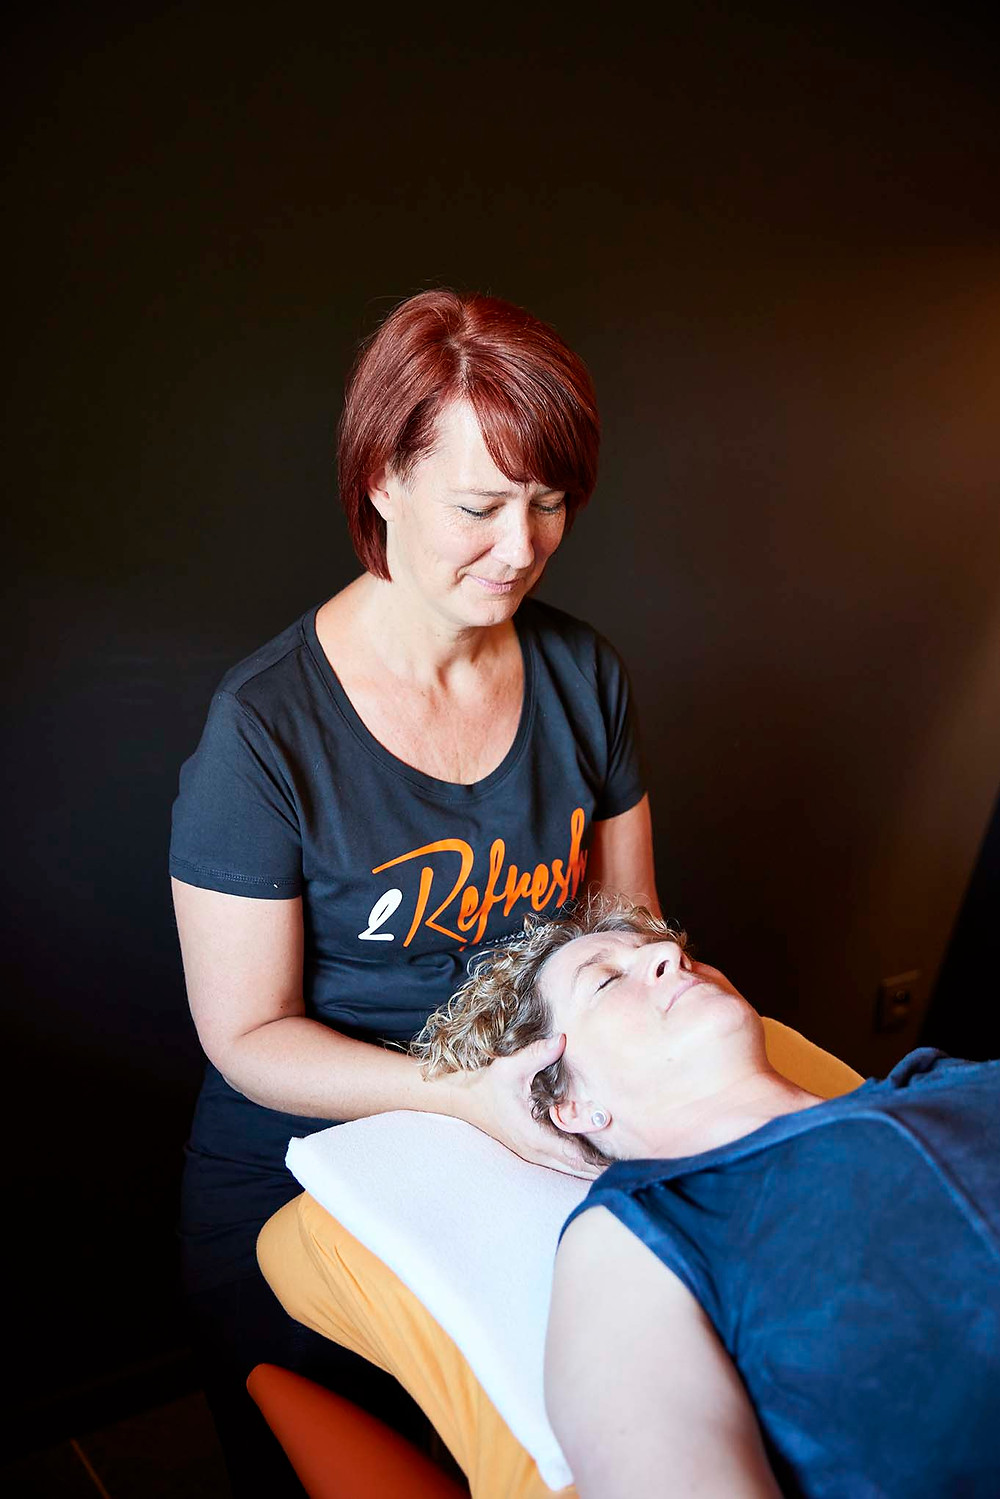 craniosacrale therapie 2refresh ontstess relax ontspan therapie behandeling stress